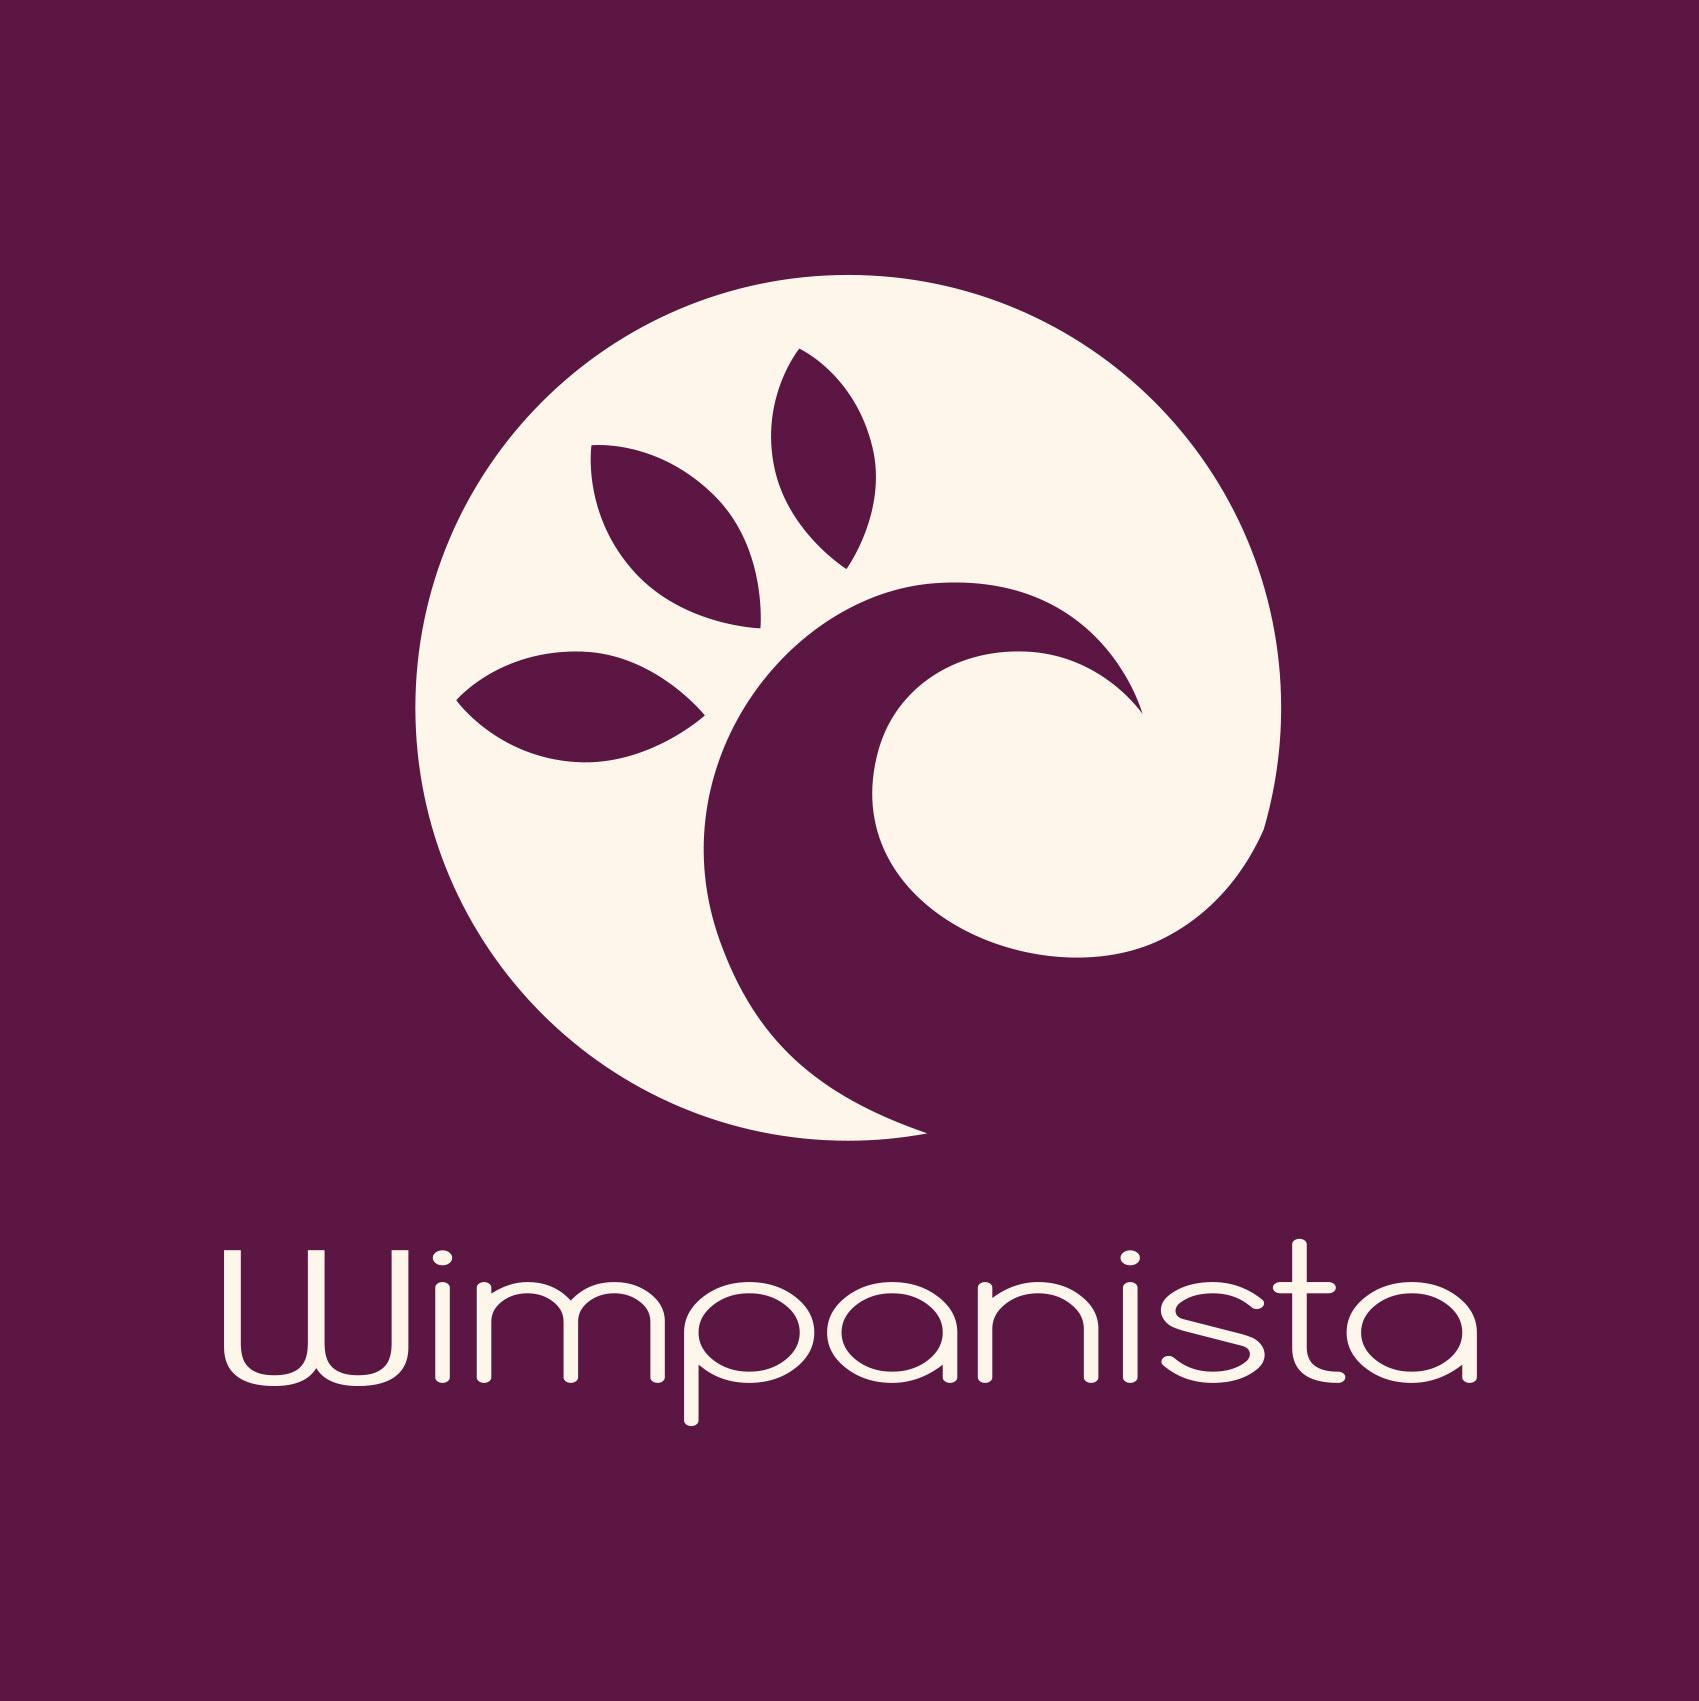 Wimpanista Logo